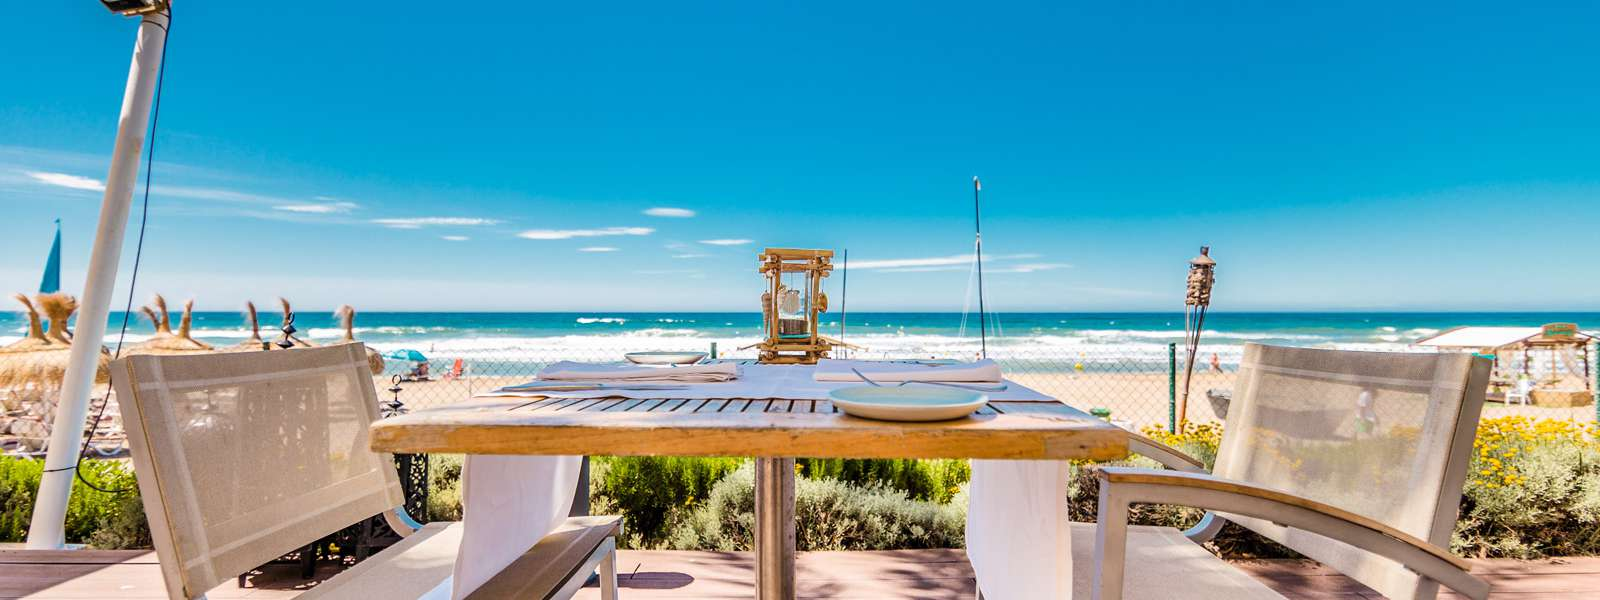 Location - Beach Club Estrella del Mar